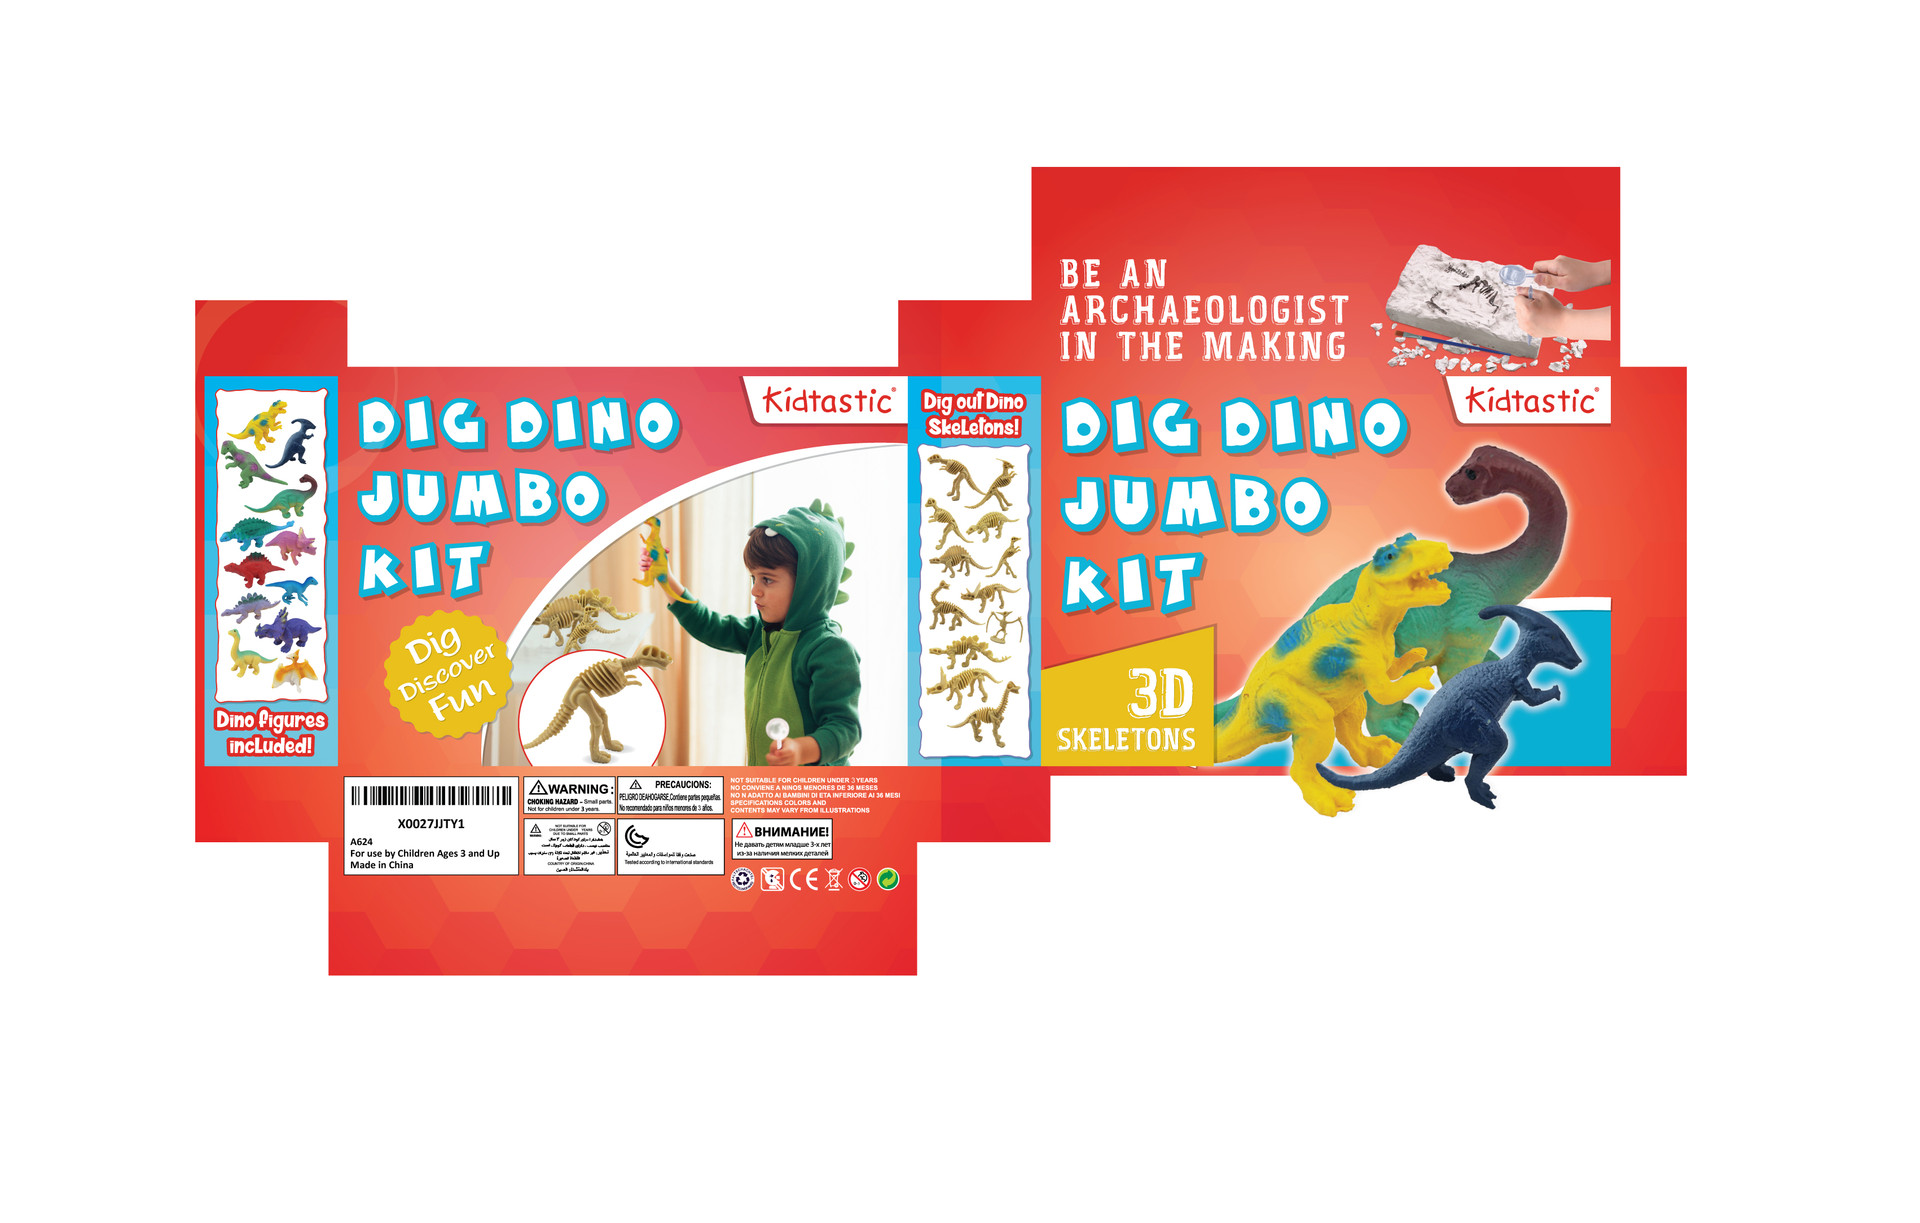 Kidtastic Dig Dino Jumbo Kit Smaller - 2